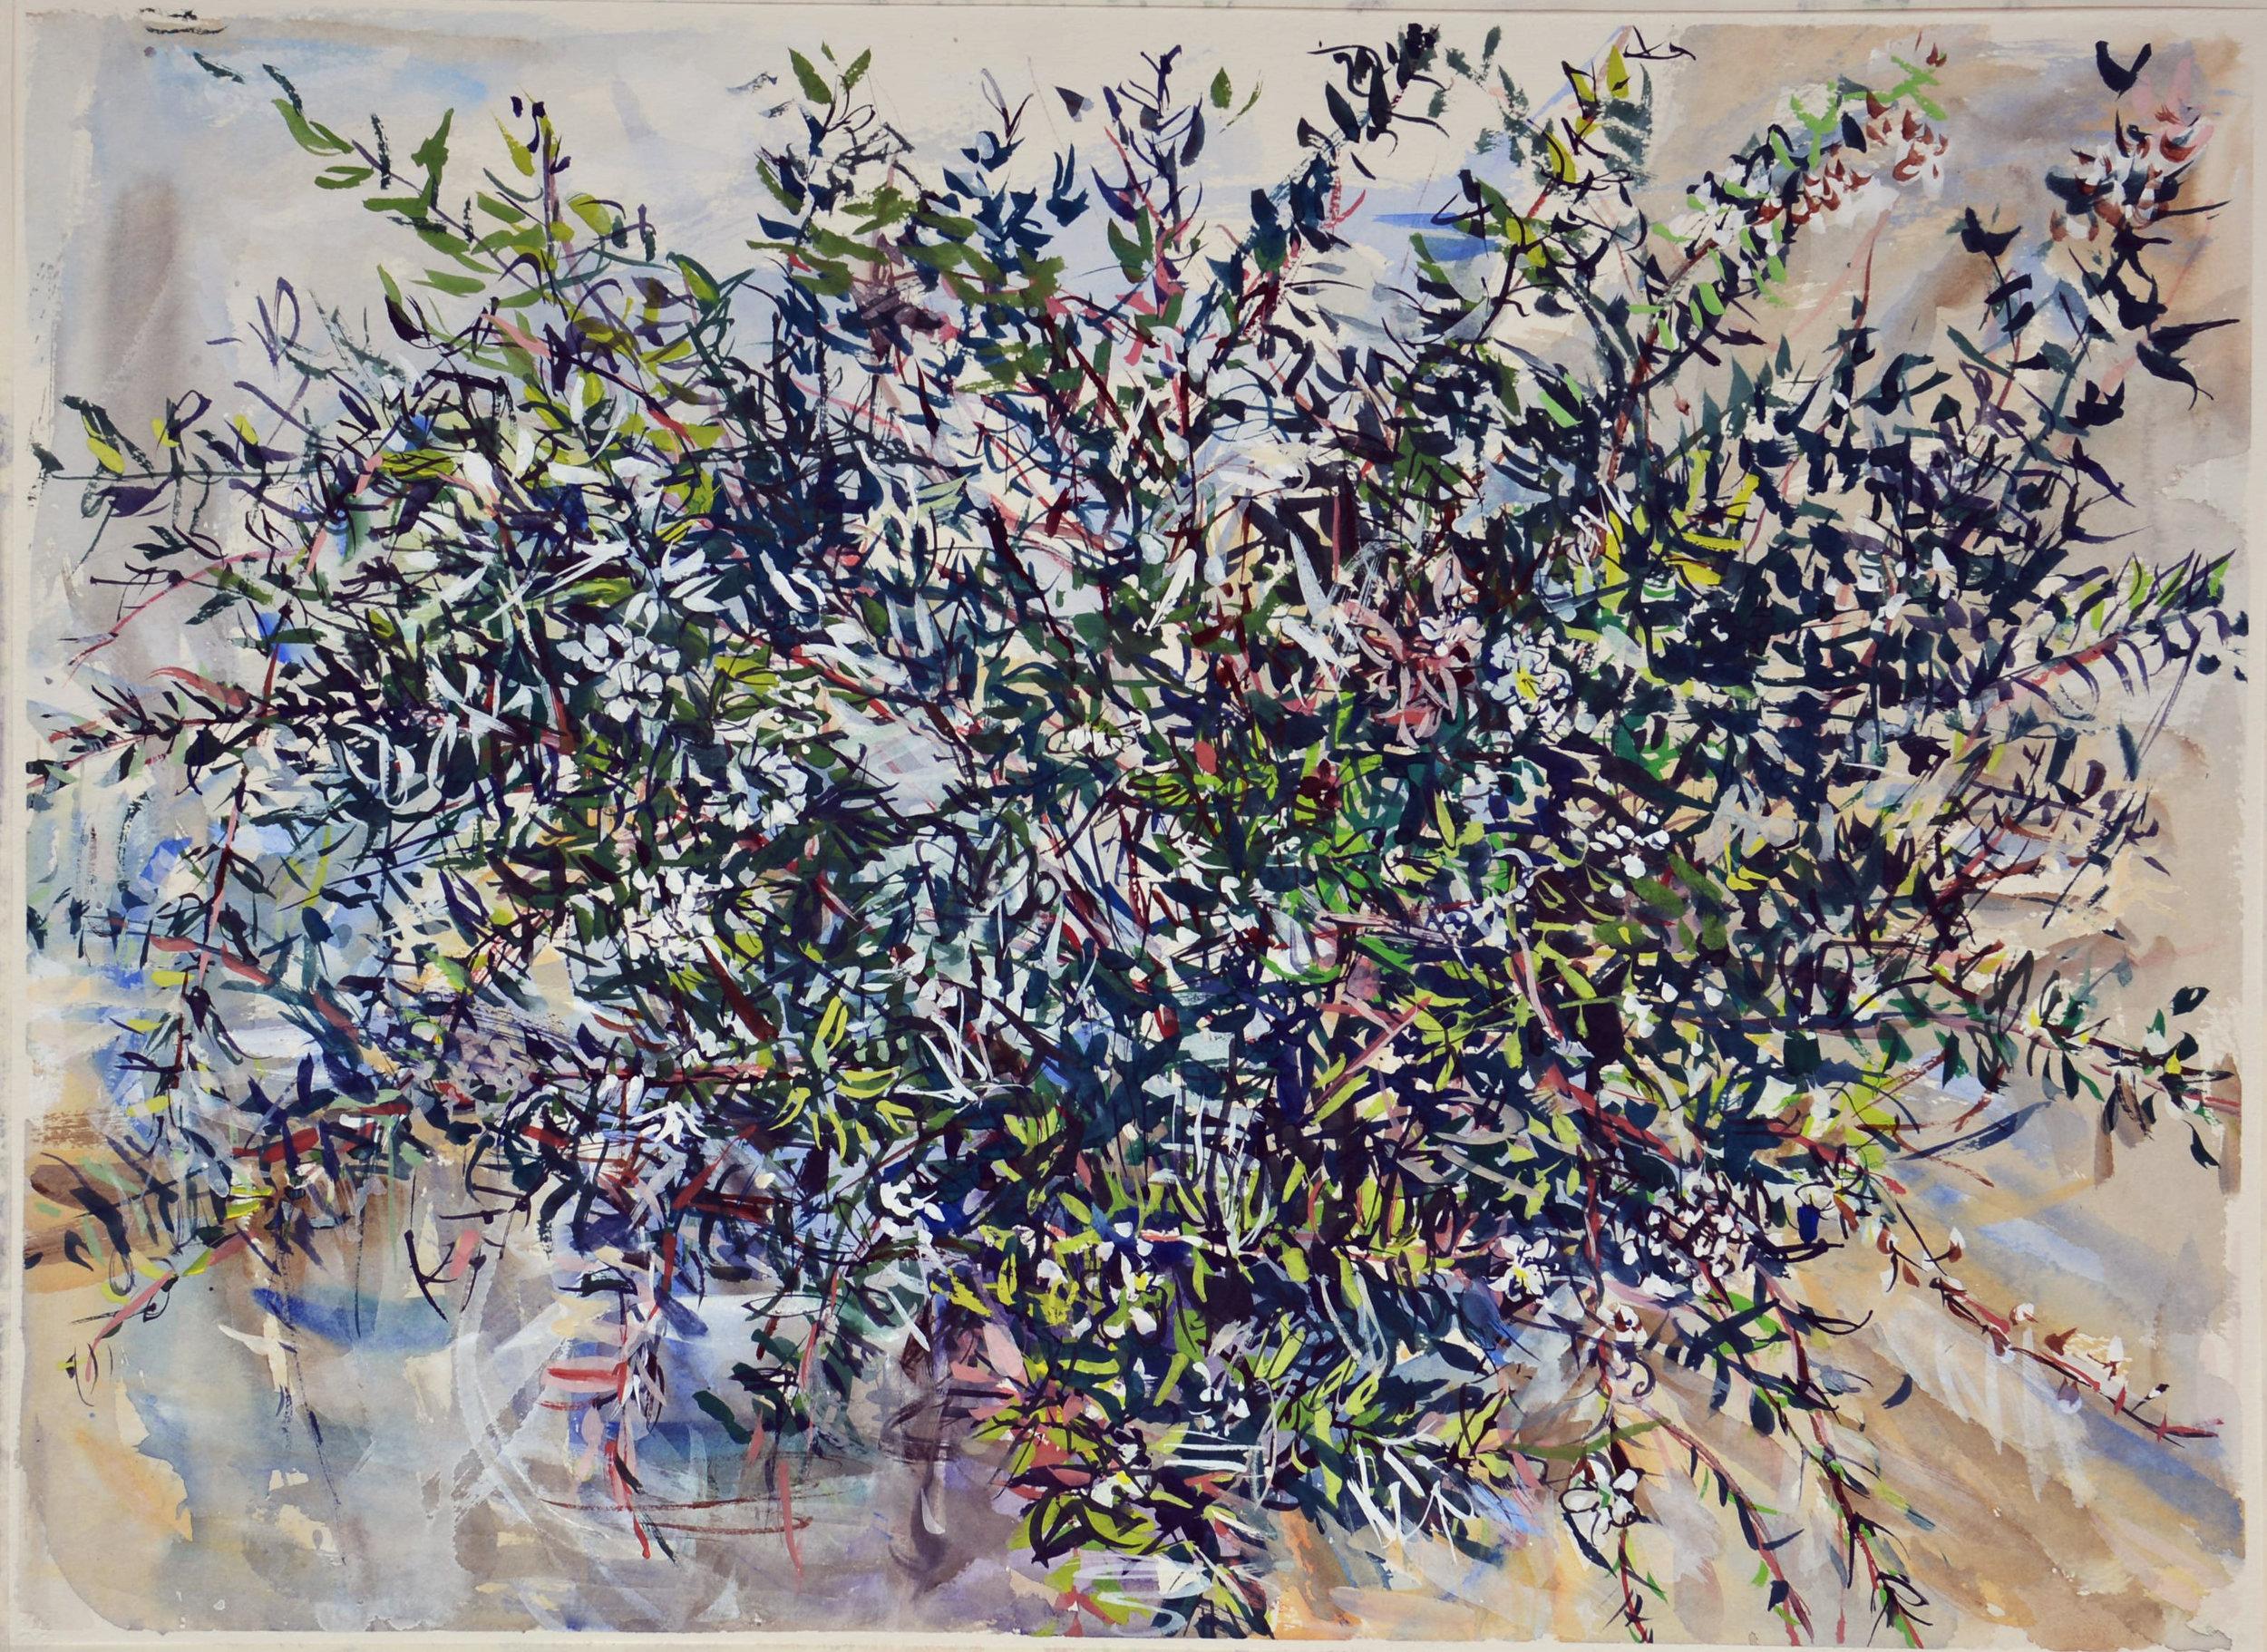 Wallum Bouquet 3 (with Leptospermum flowers) 2081 gouache on rag paper 57 x 77cm